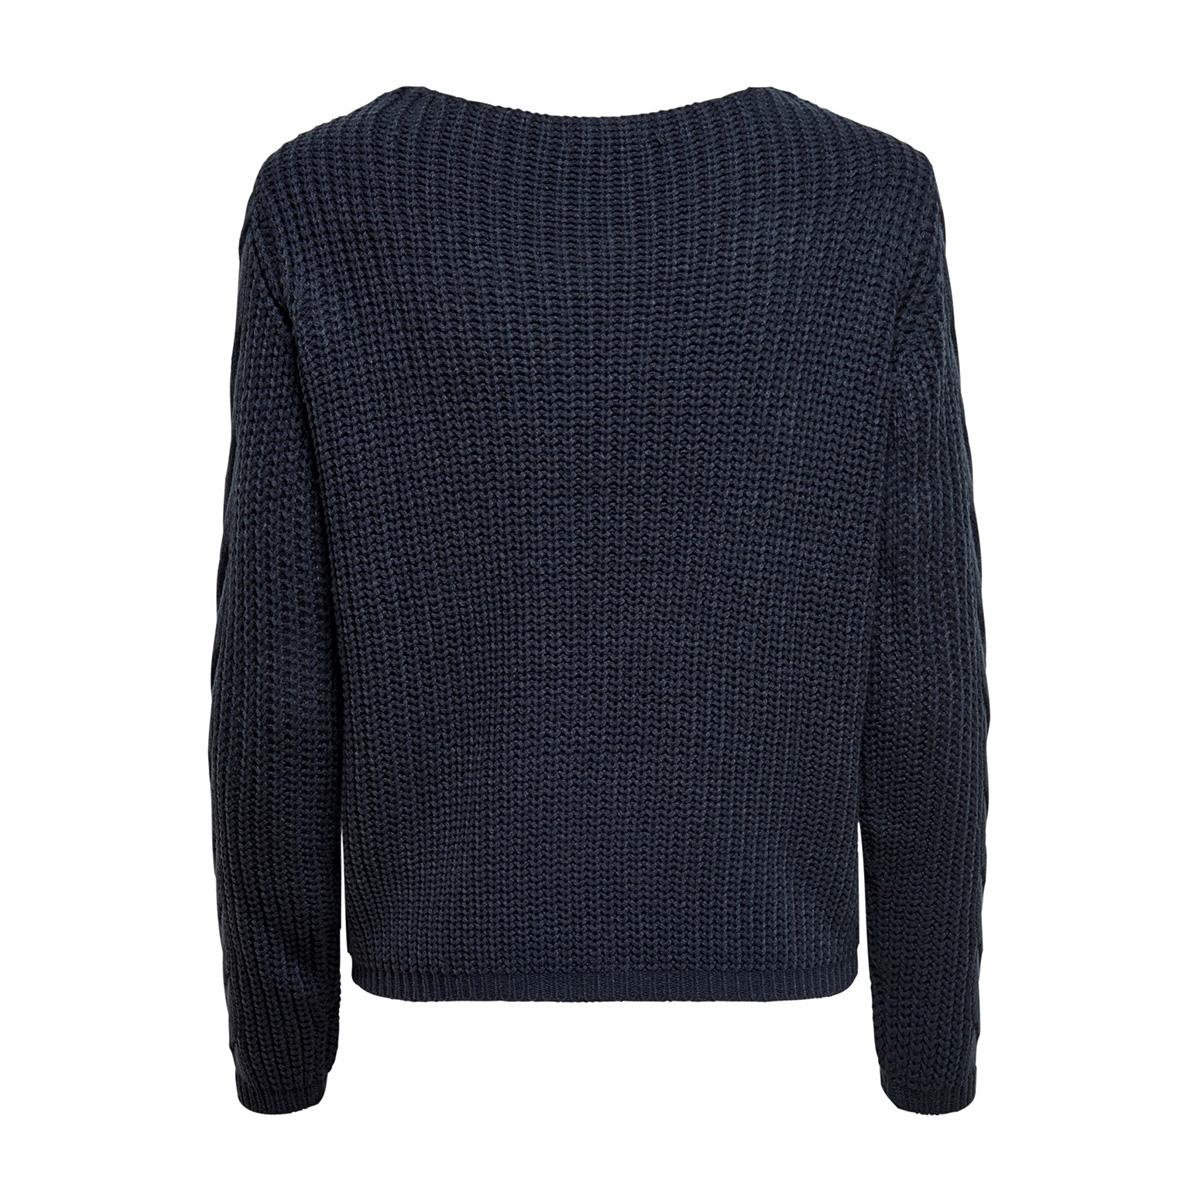 jdybella l/s pullover knt 15185575 jacqueline de yong trui navy blazer